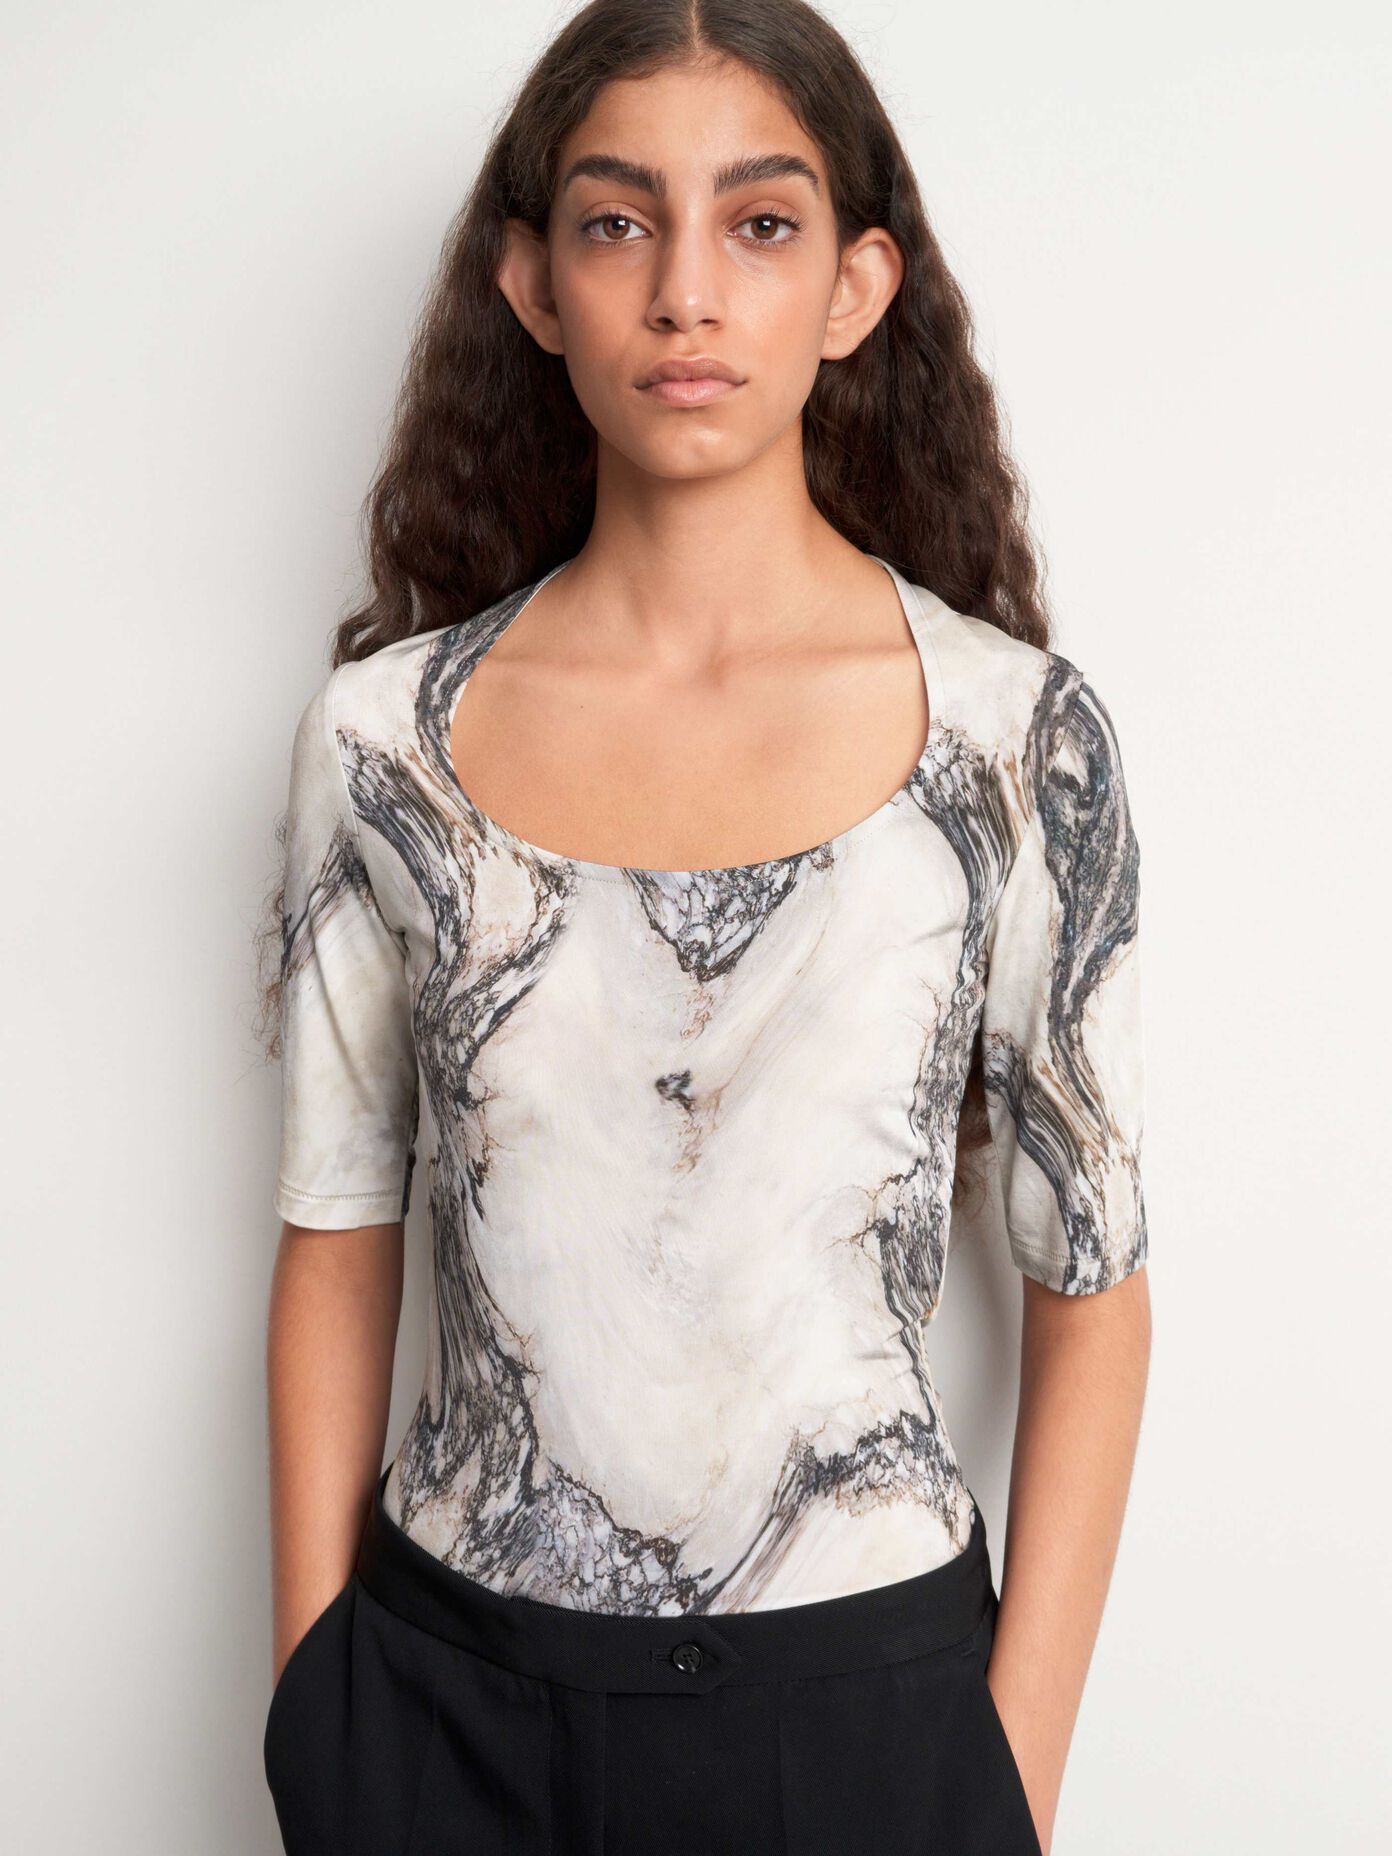 Idyllwind Women/'s Sweet Tea Floral Lace Tank Top Blouse Black IH18W4